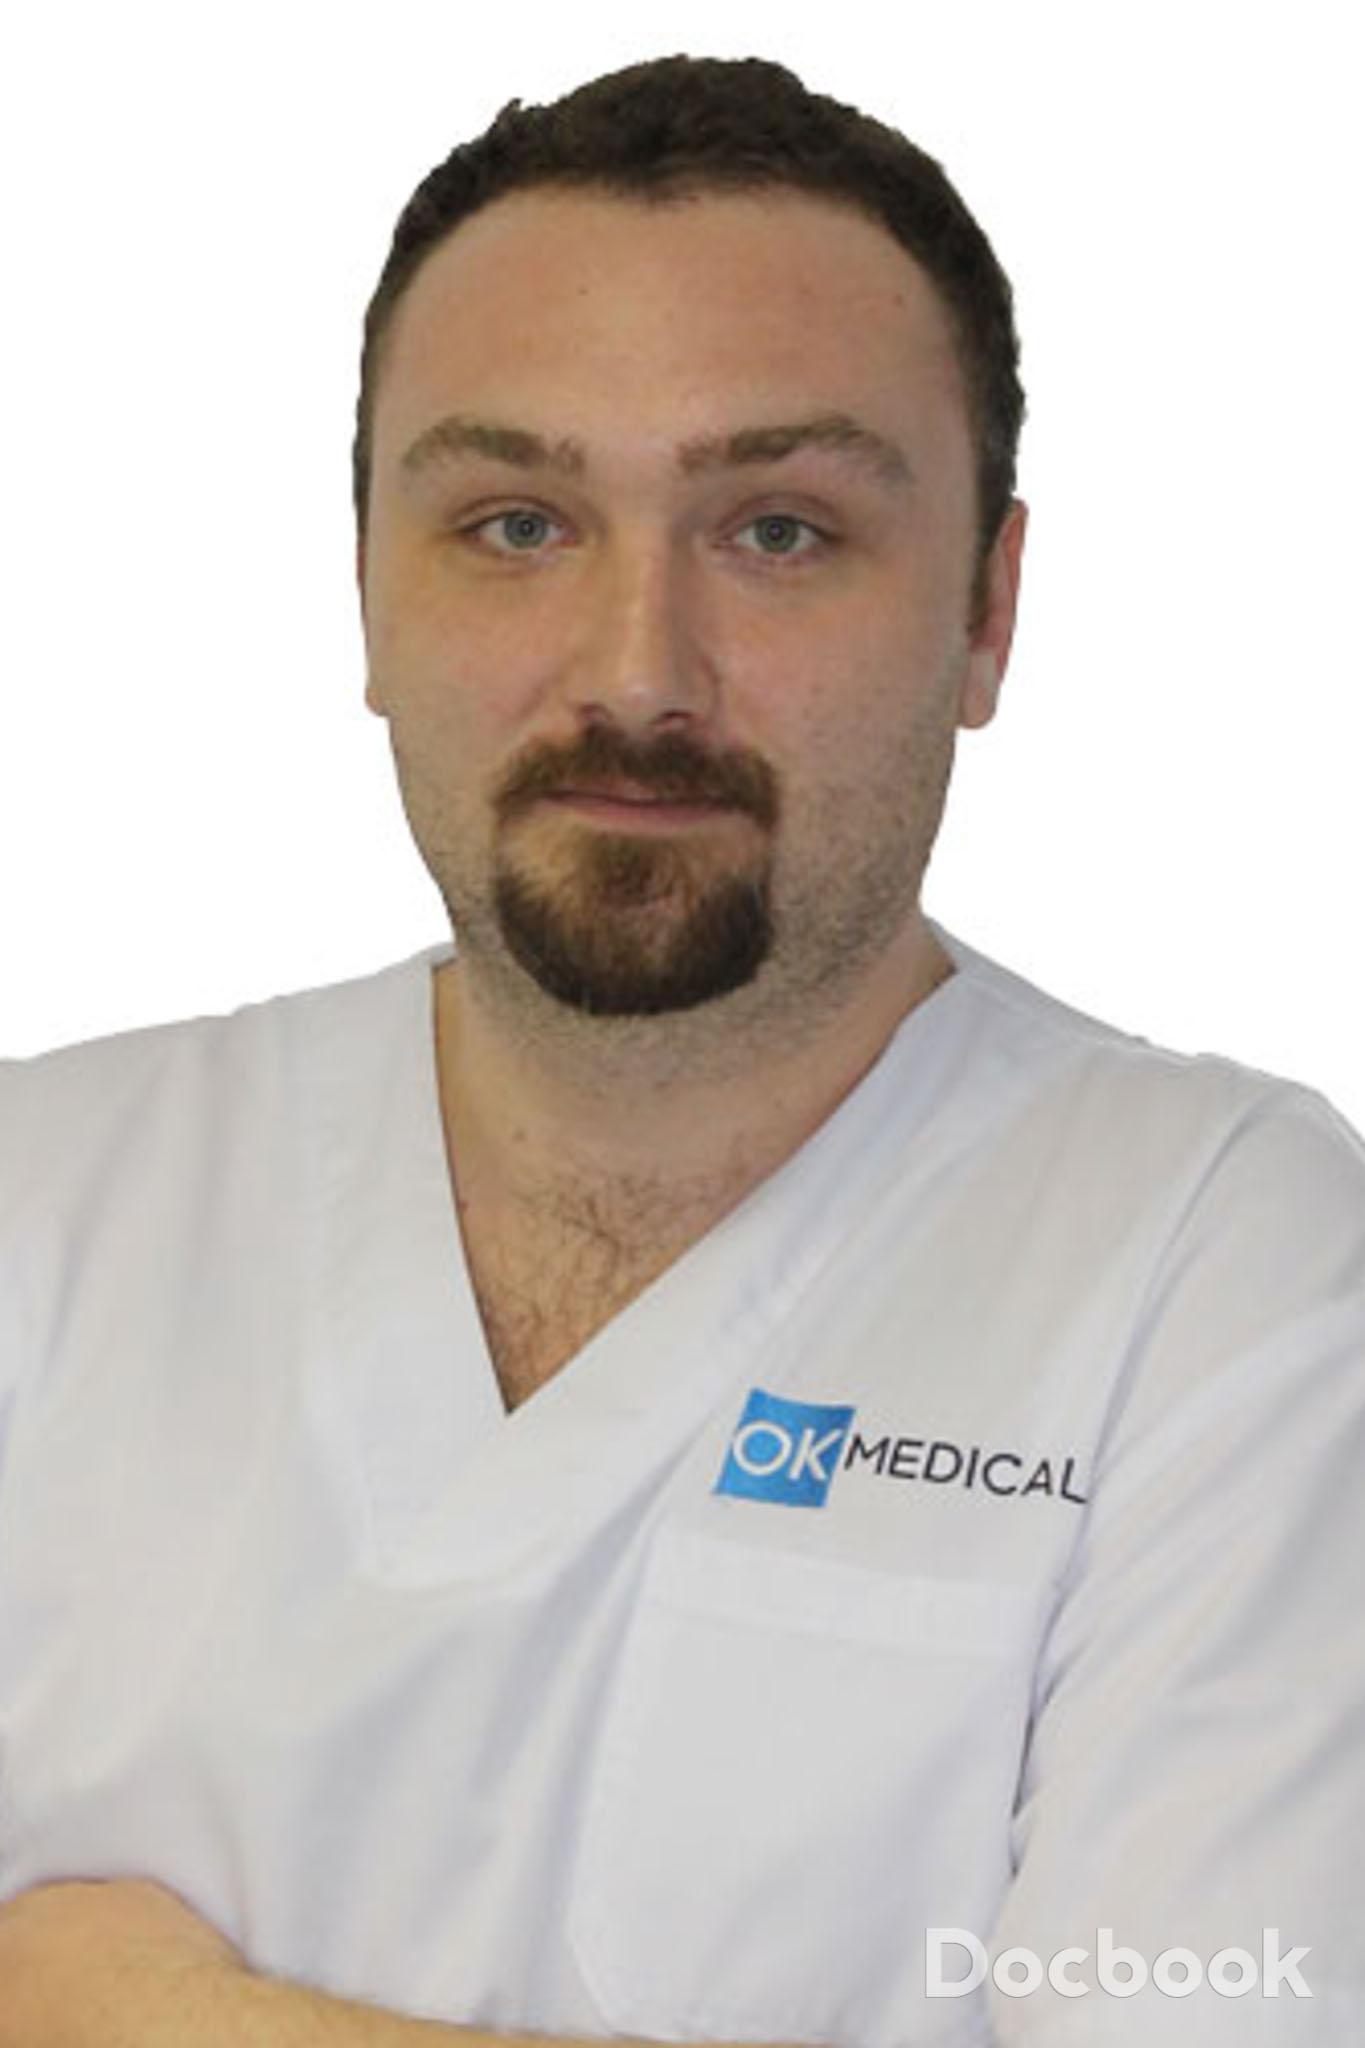 Dr. Madalin Guliciuc